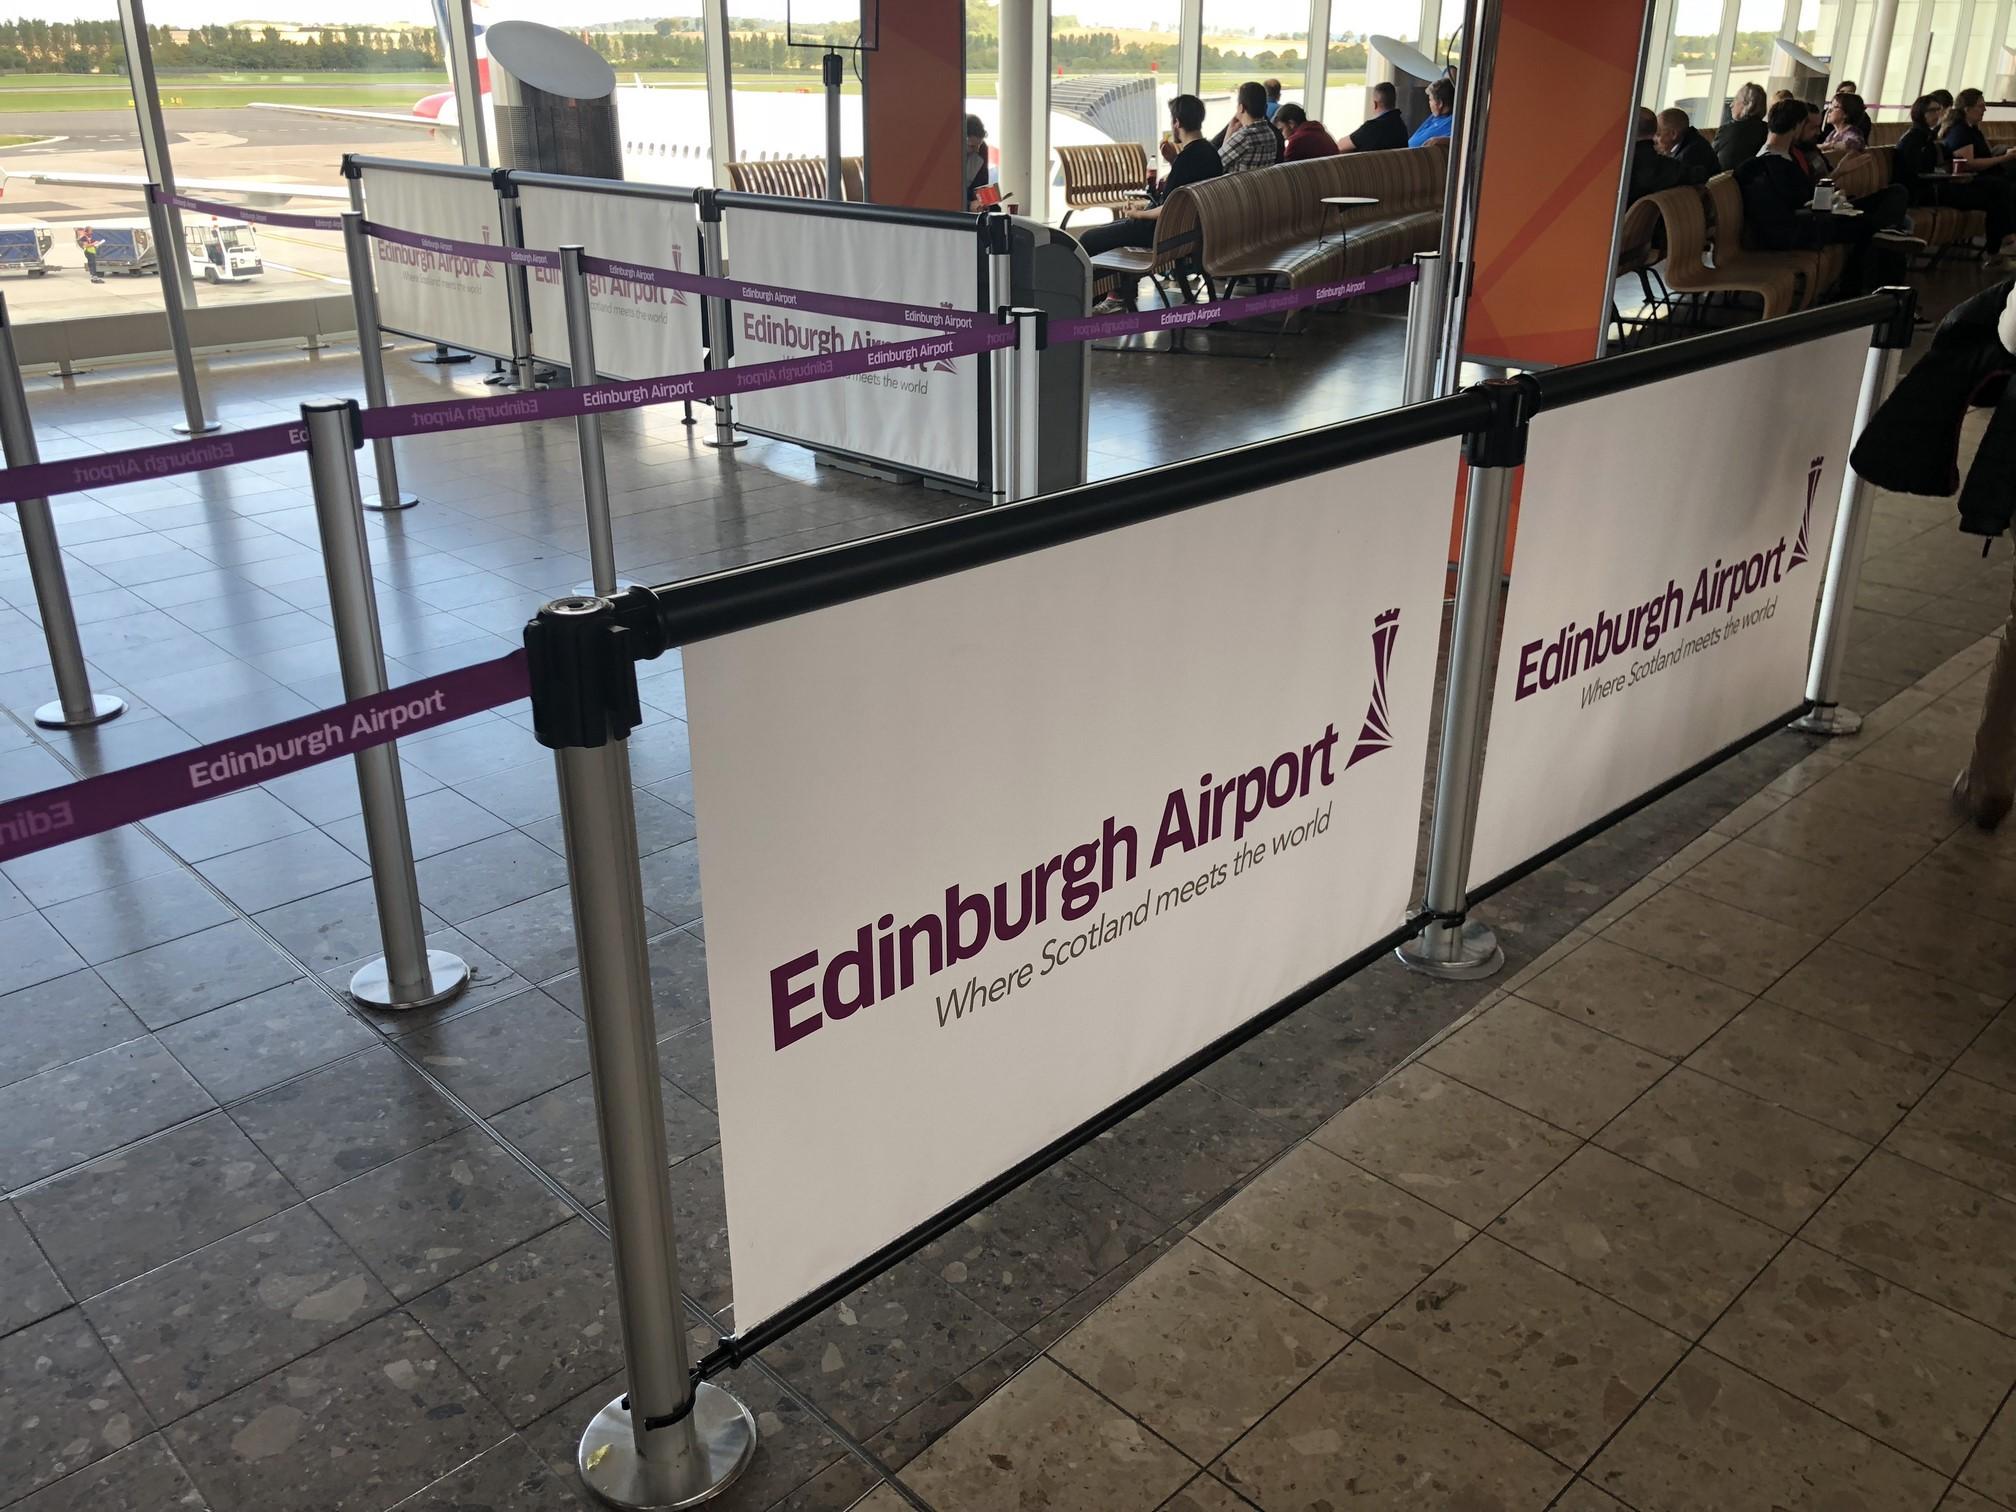 8 Edinburgh Airport